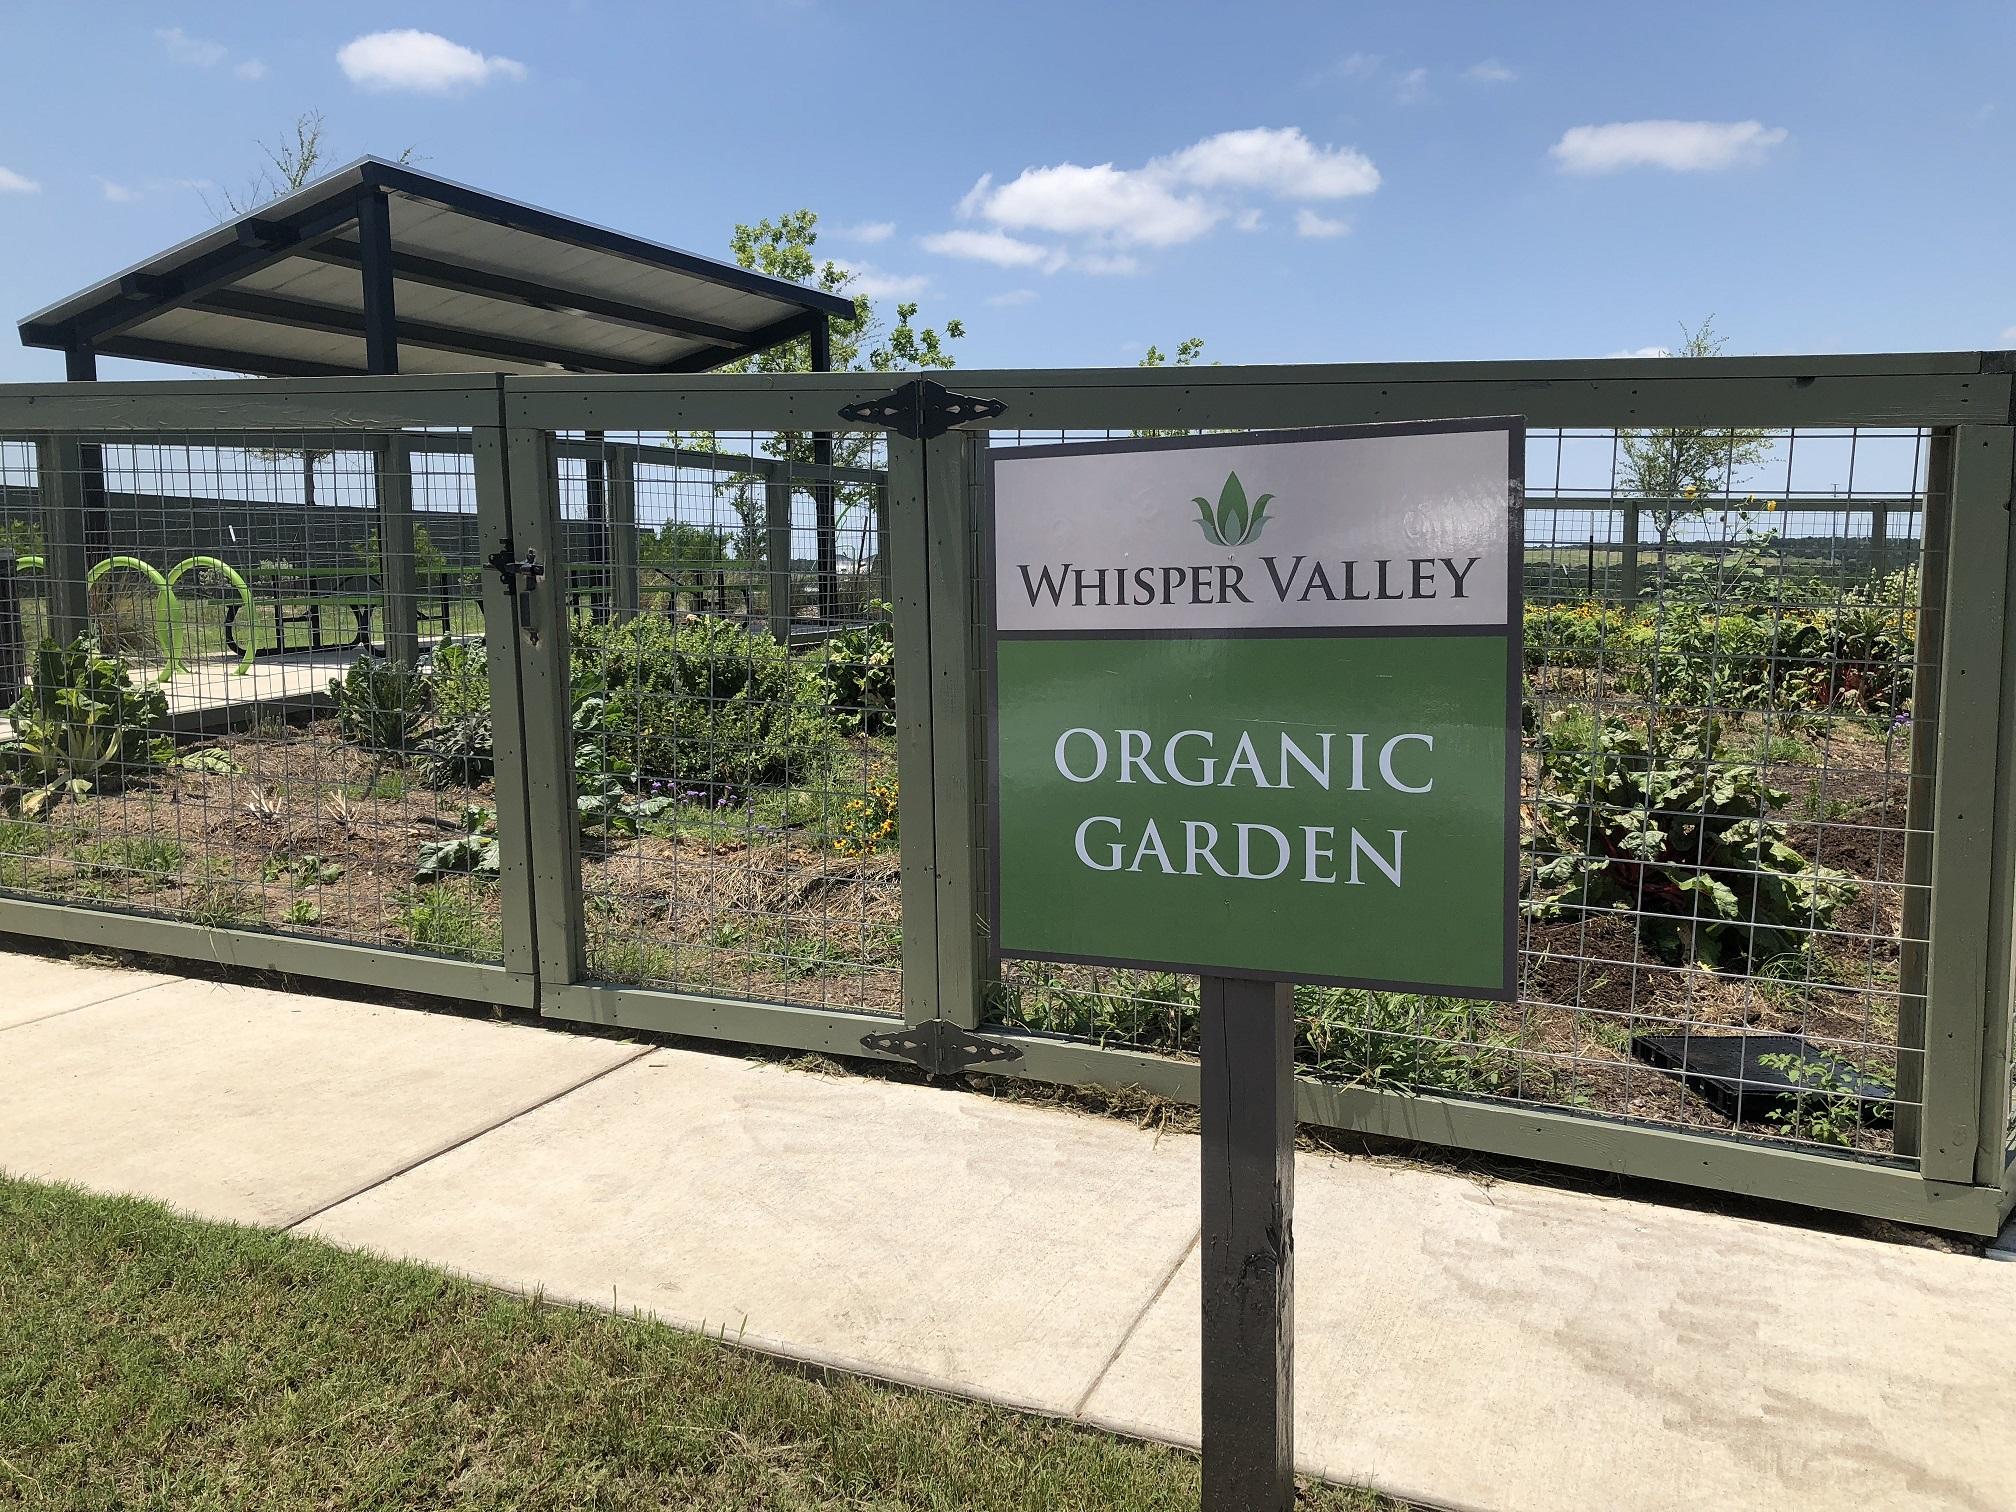 Whisper Valley Organic Garden